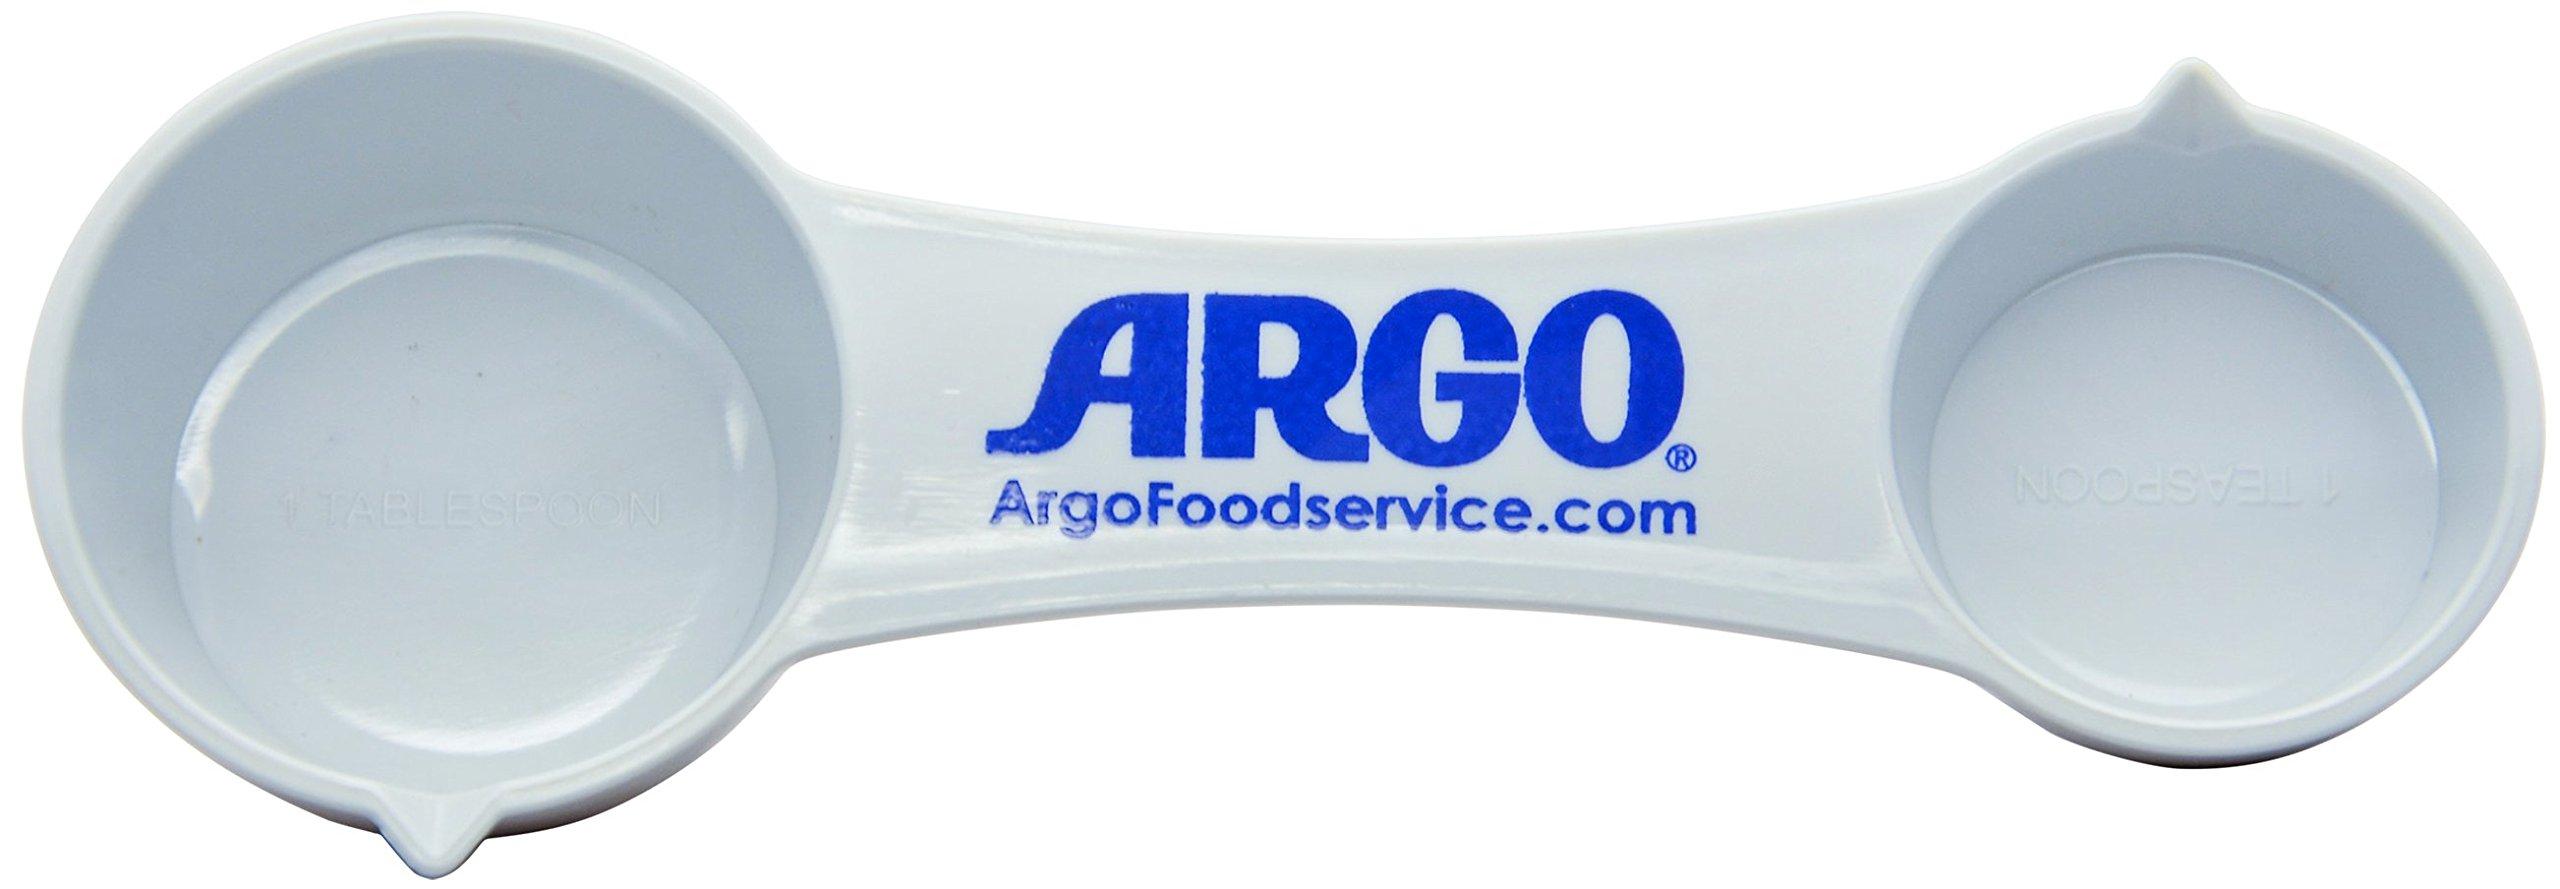 Argo Corn Starch Powder Pure 25 Pound Foodservice Bag and Argo Measuring Spoon by ARGO (Image #3)